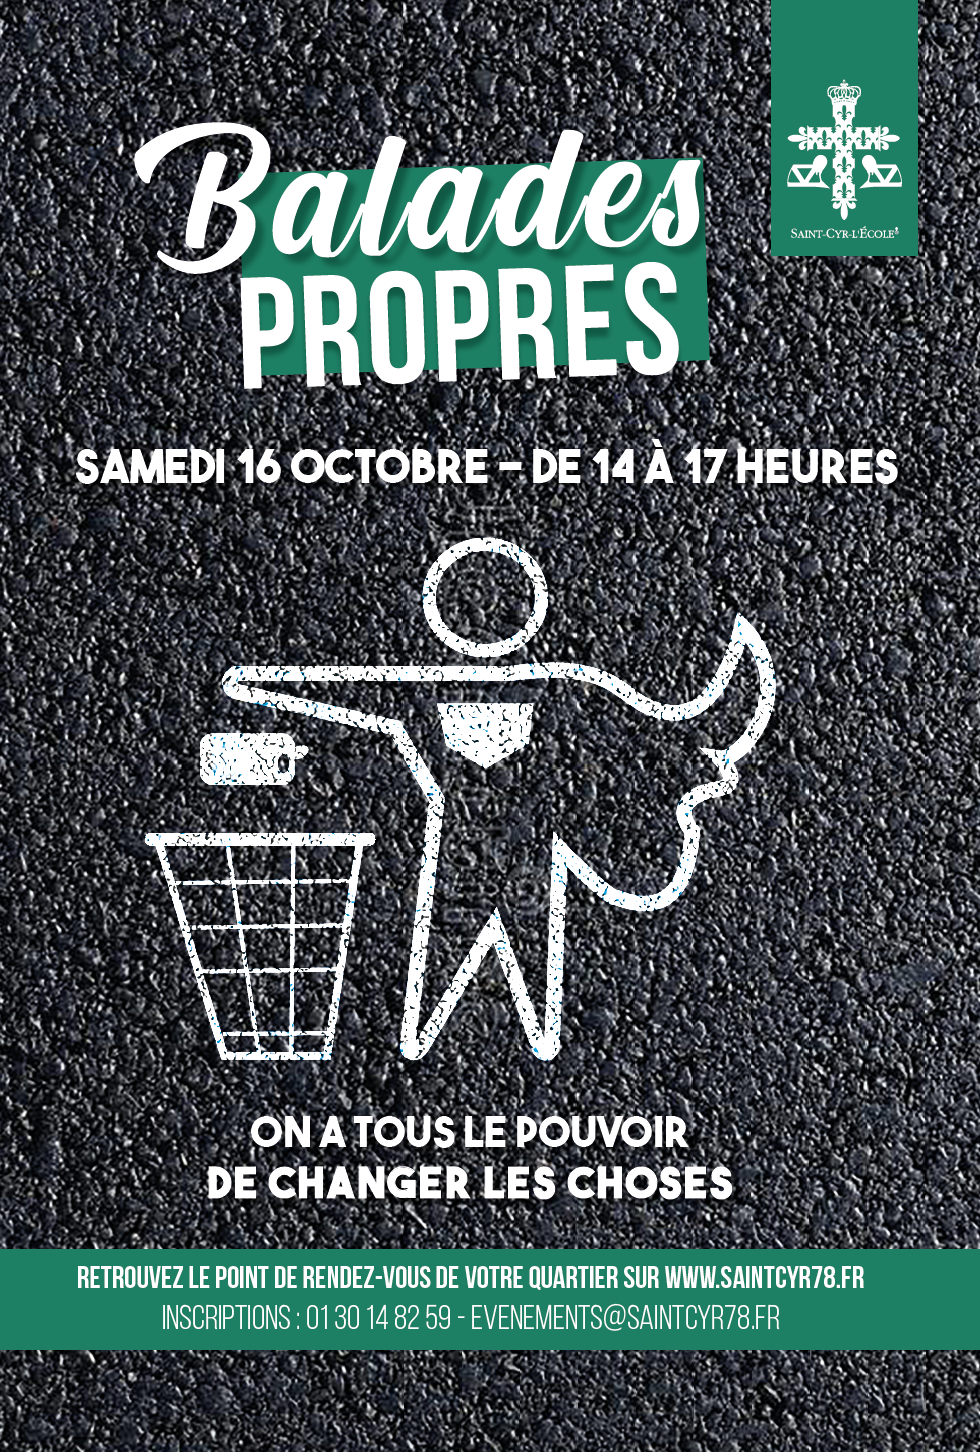 Les balades propres à Saint-Cyr